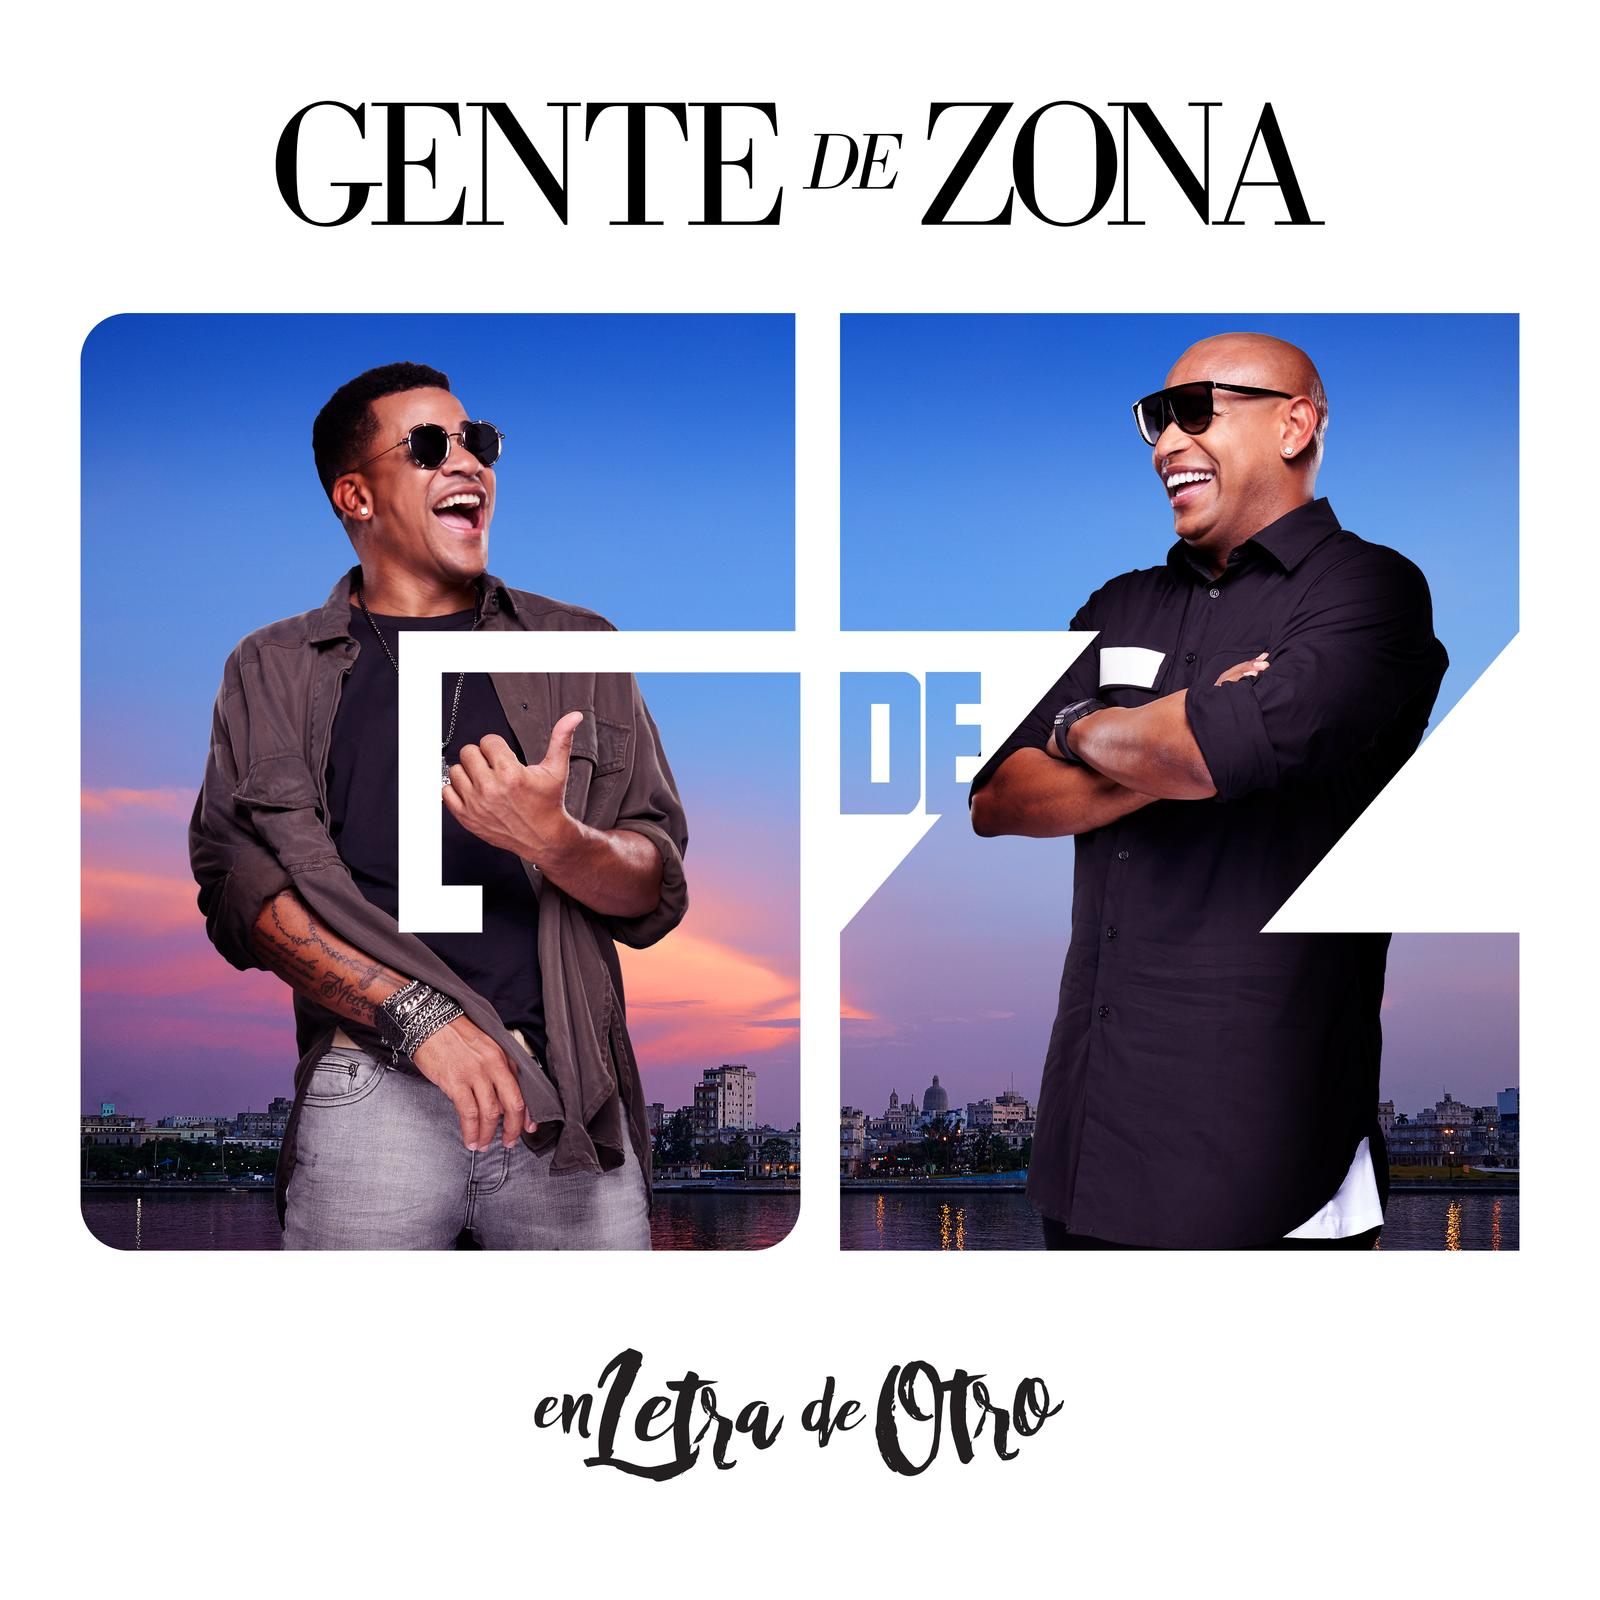 GenteDeZona_EnLetraDeOtro